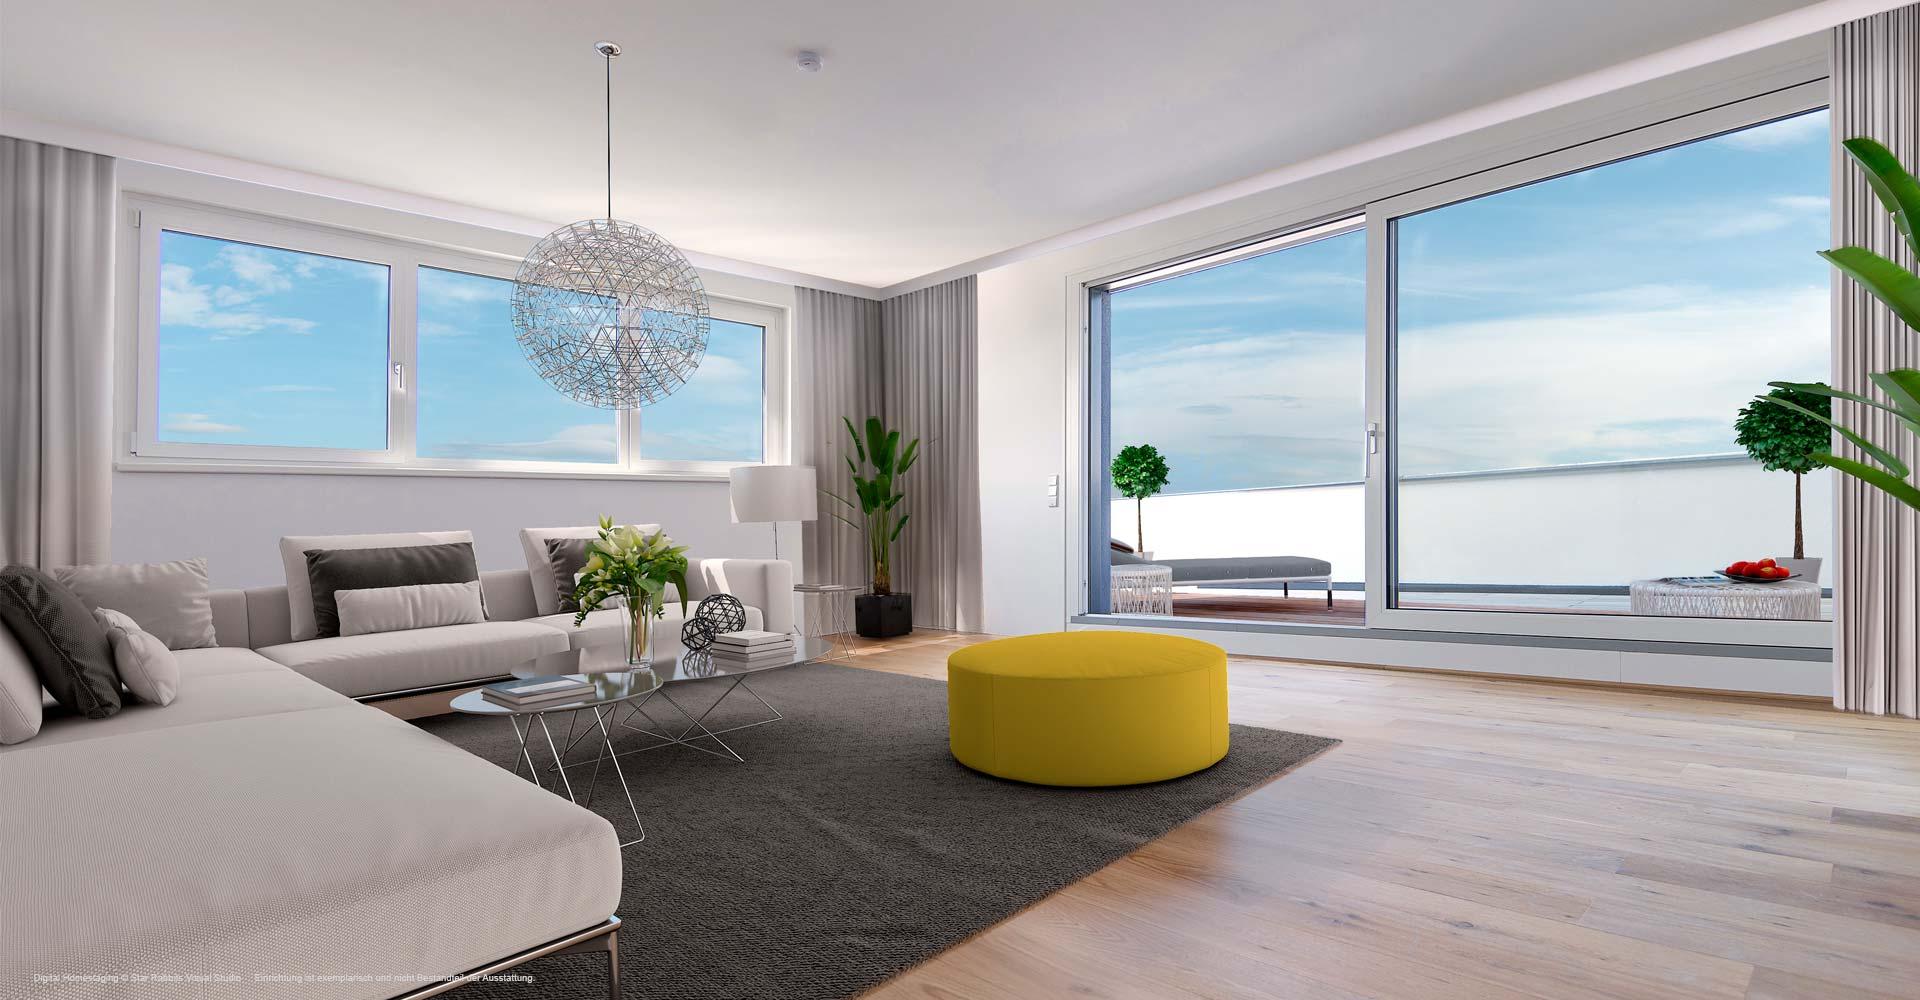 villanova - Penthouse Wohnung